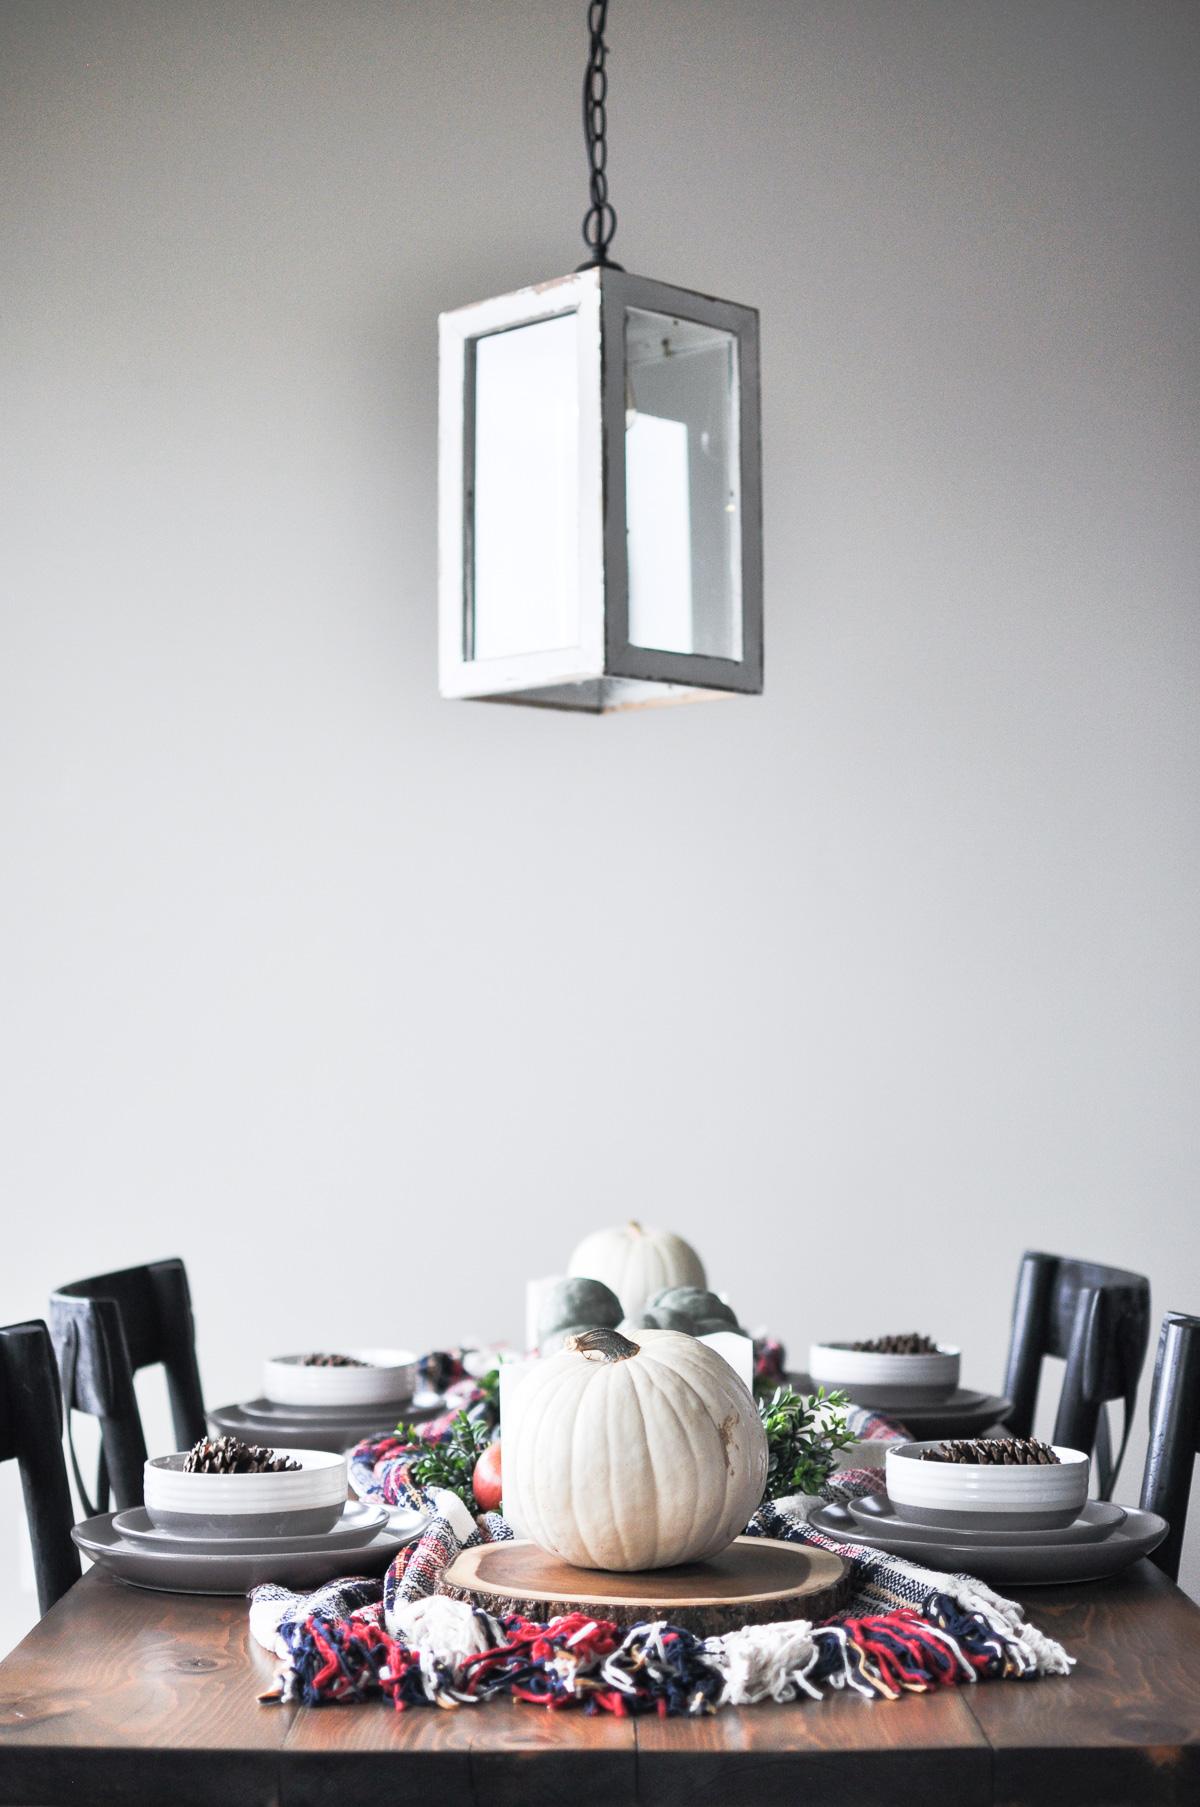 https://cherishedbliss.com/a-simple-cozy-fall-tablescape/